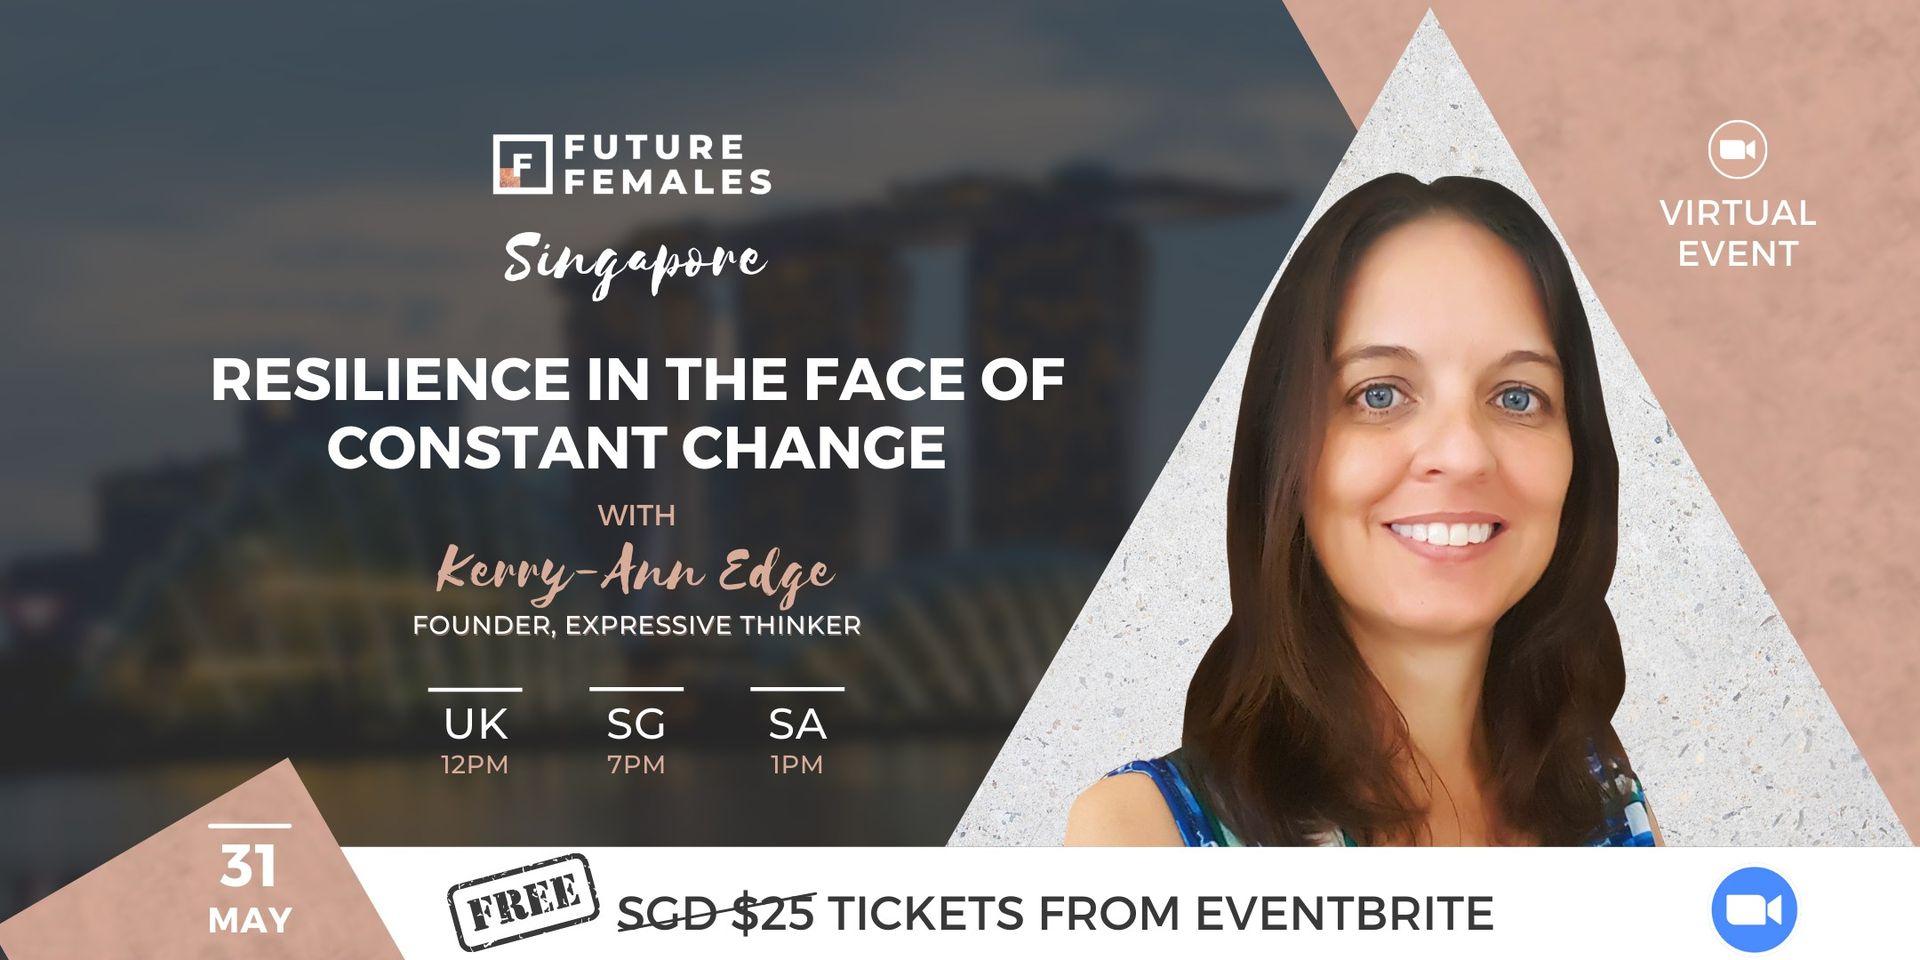 Future Females Singapore Event - 31 May